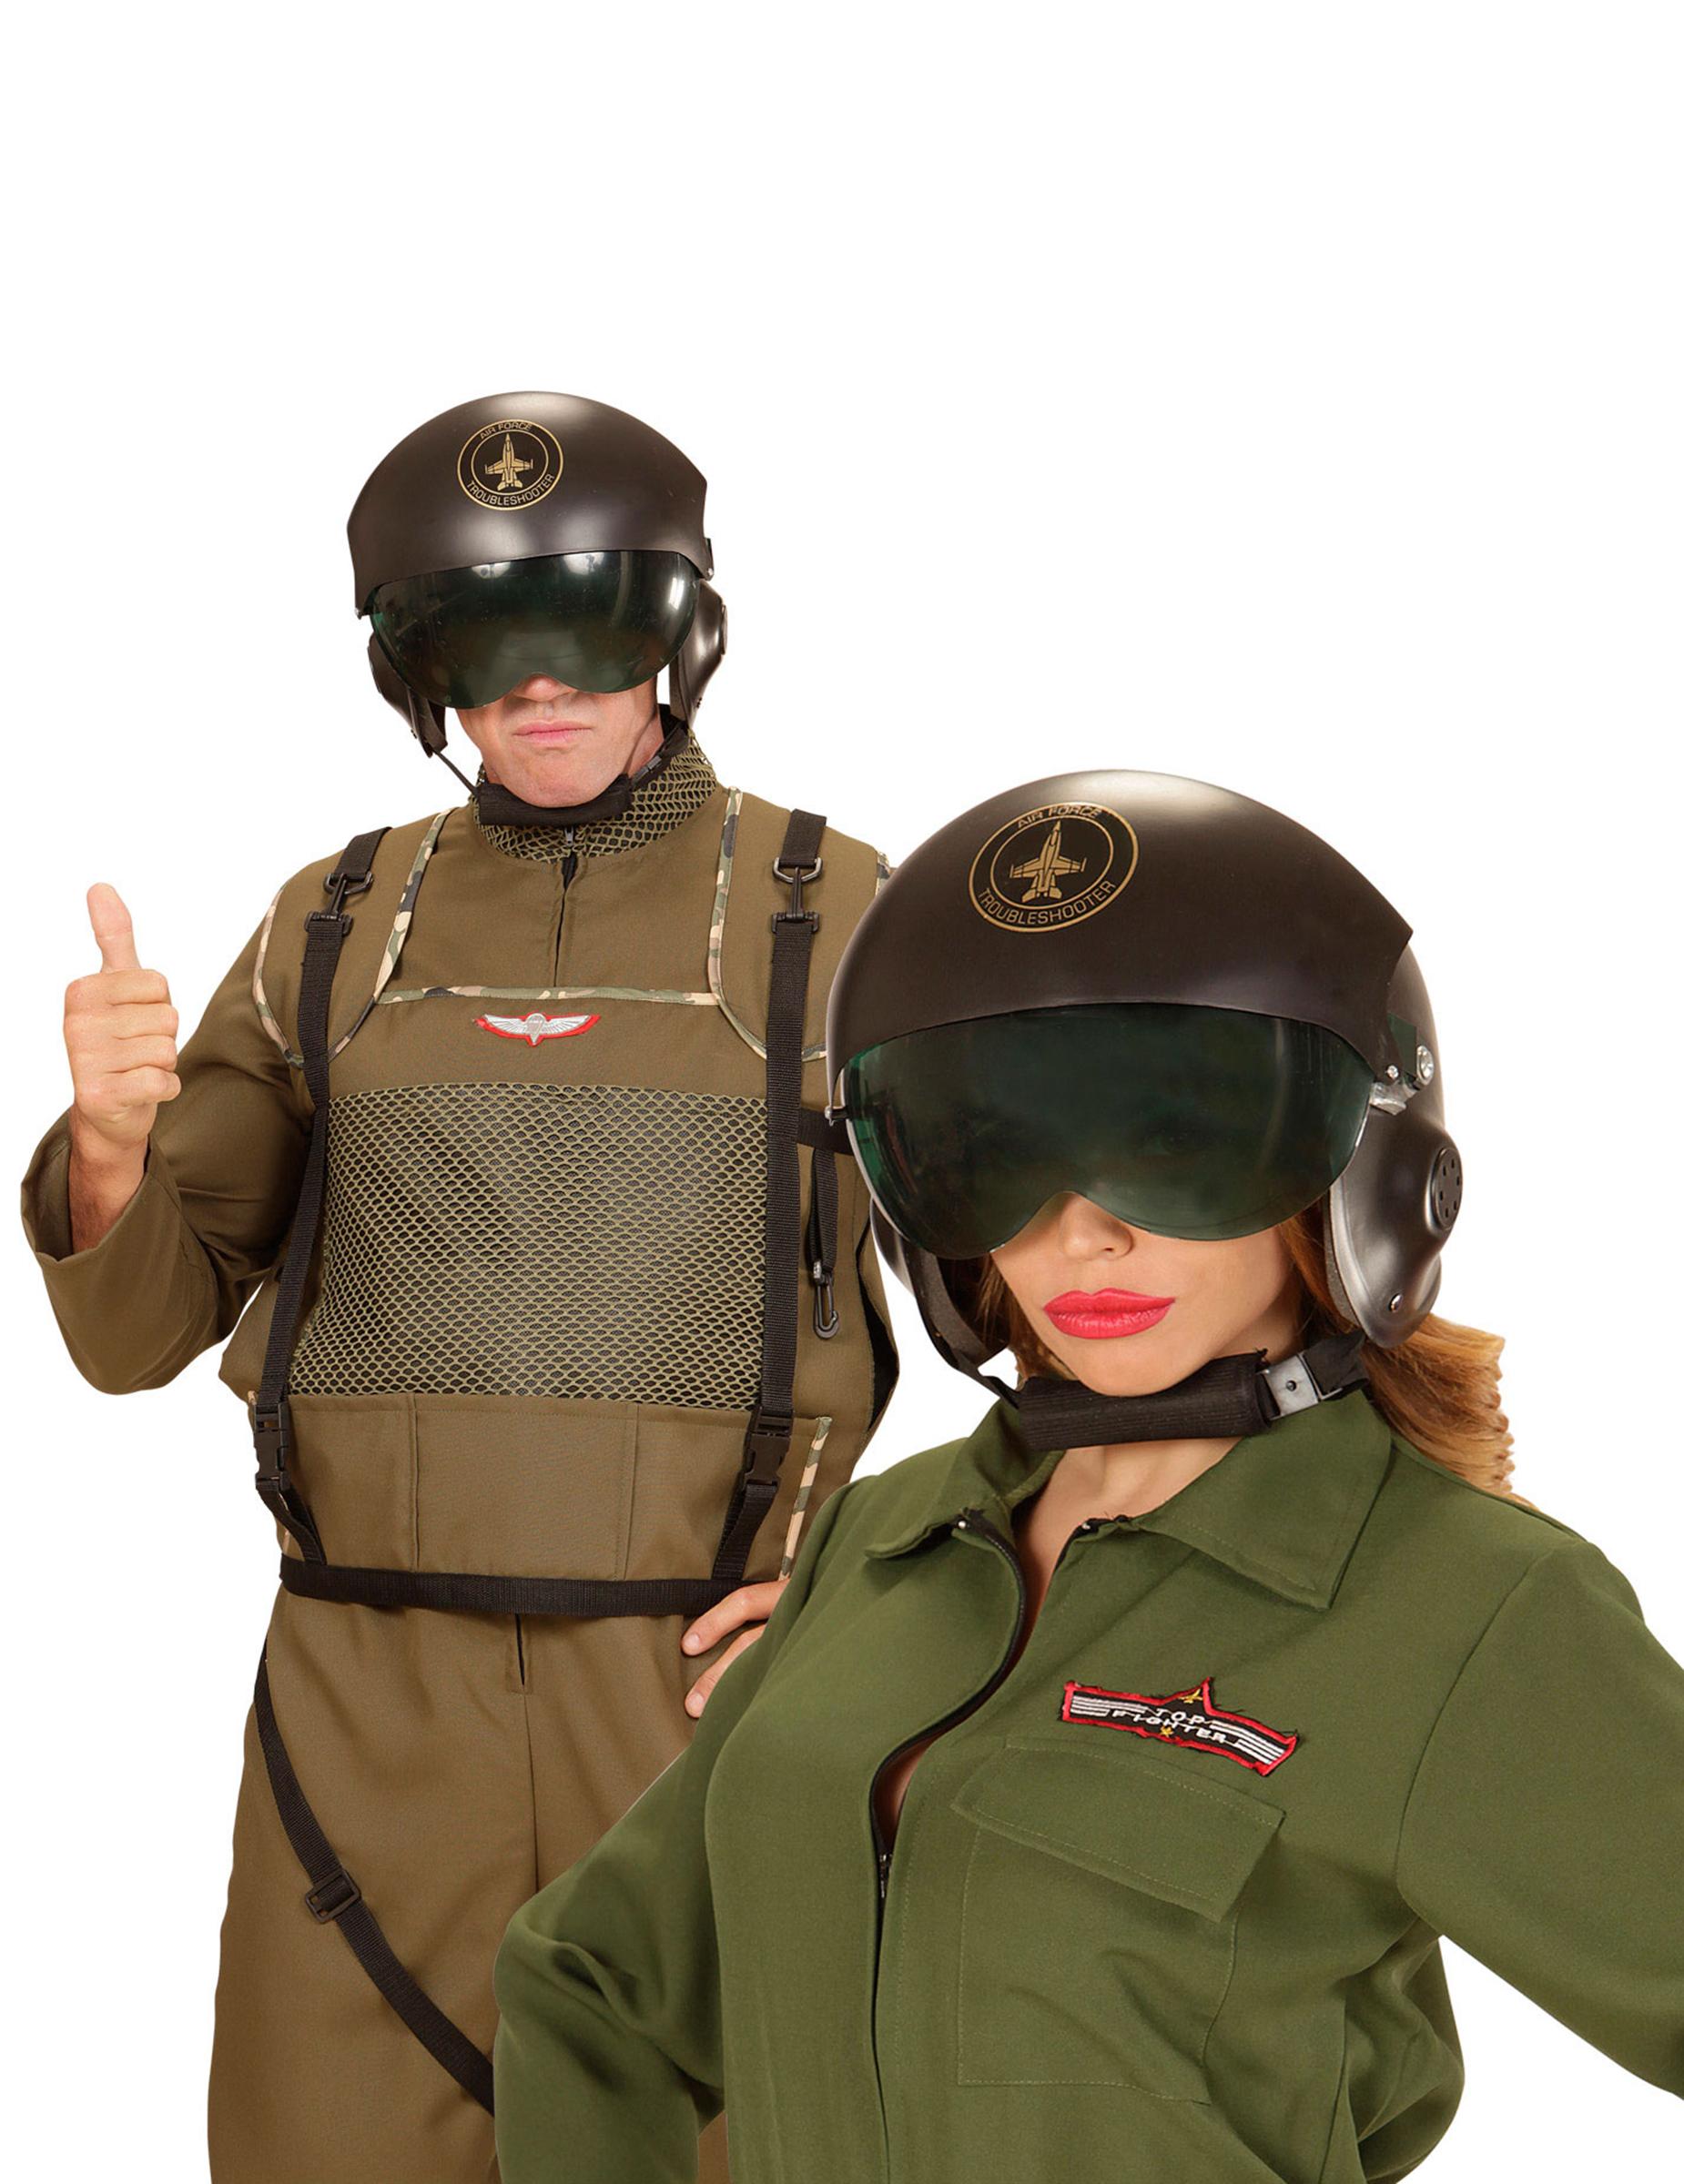 Kit pilota di linea Taglia Unica qNZ2mtkE